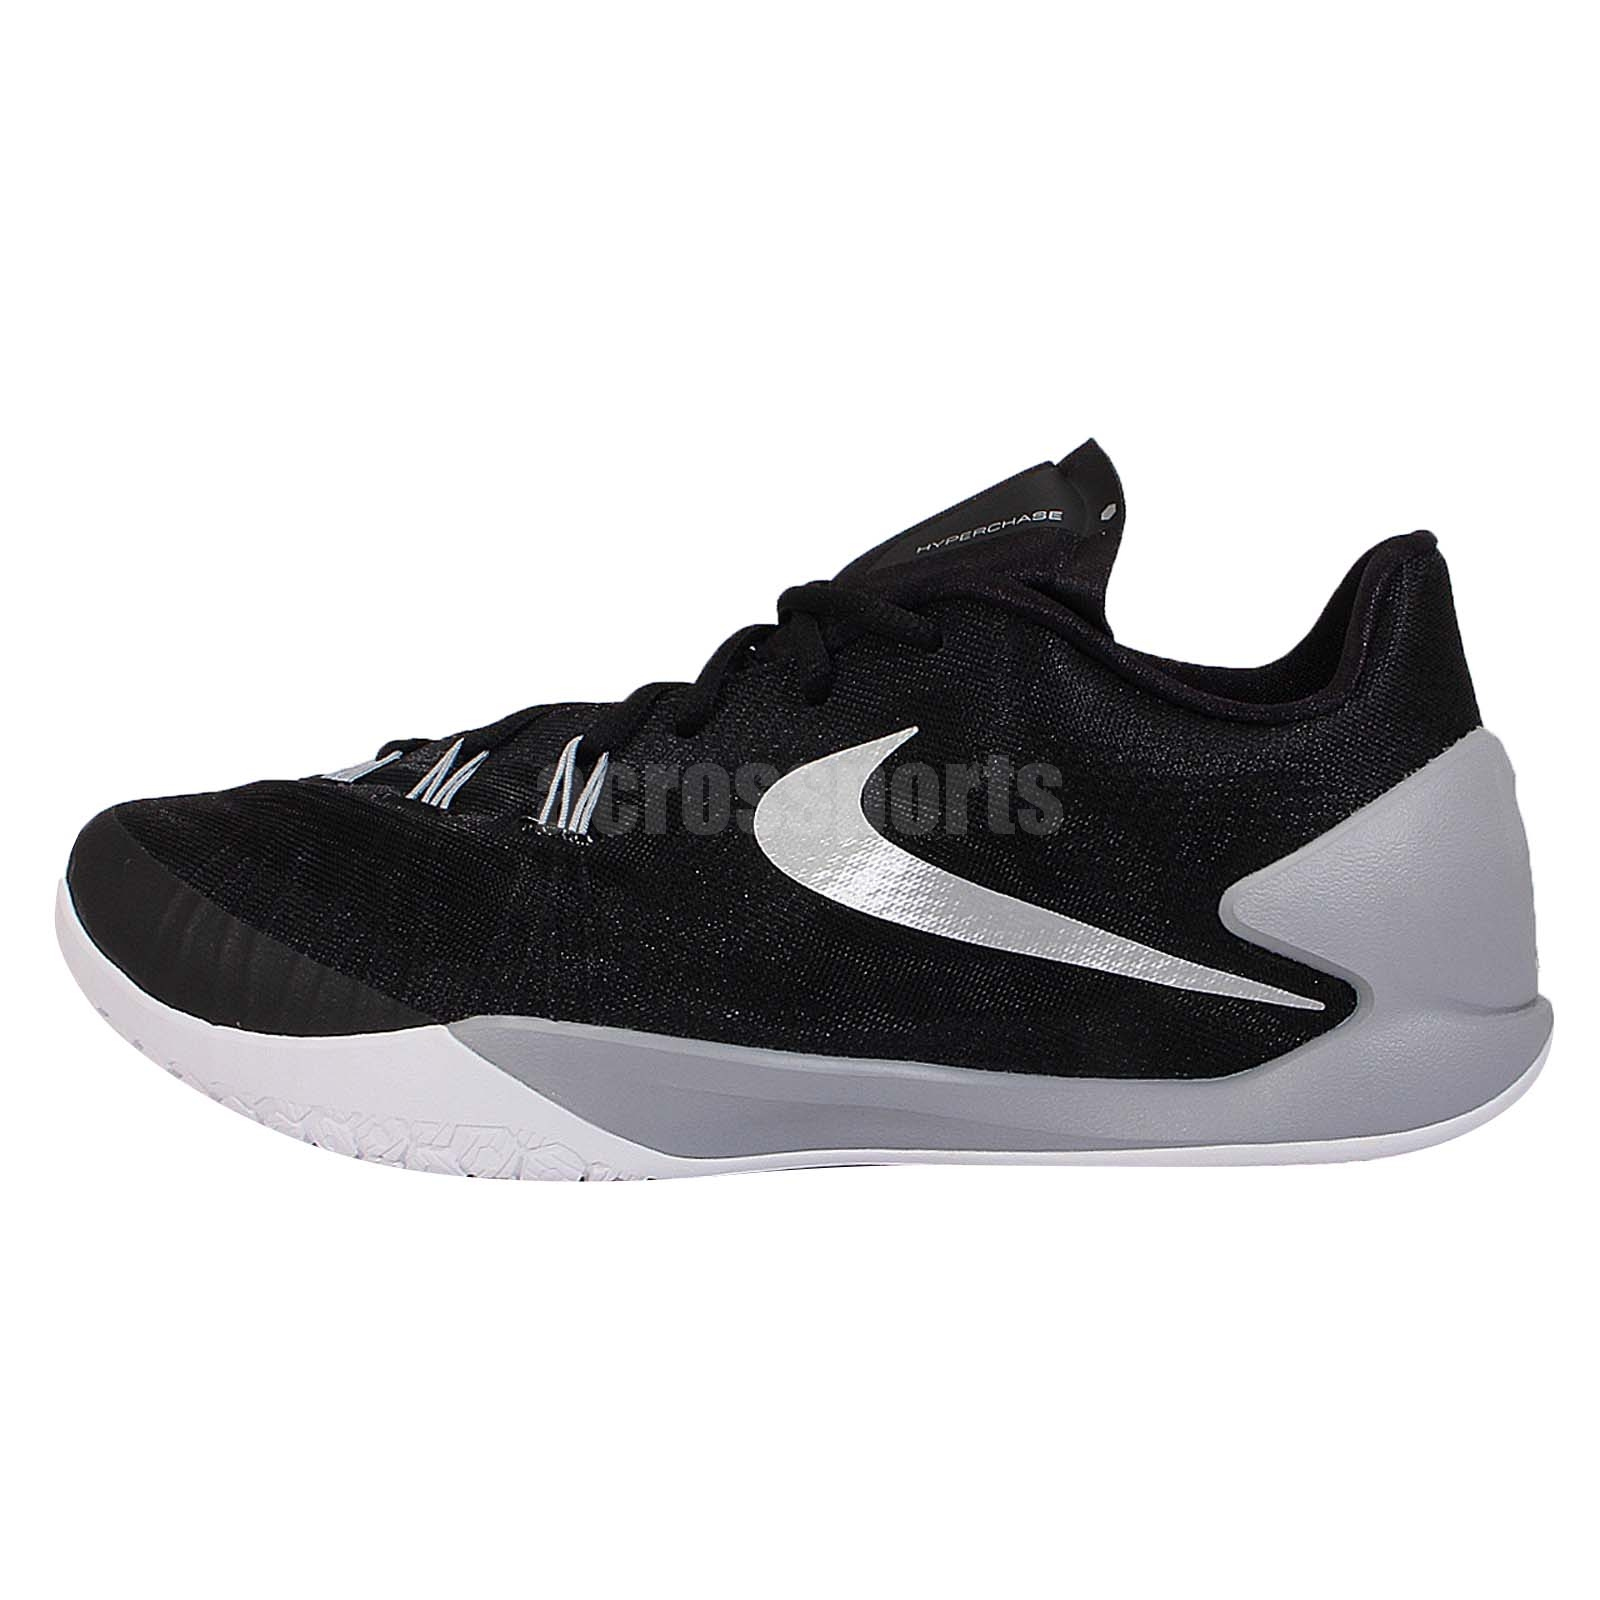 James Harden Nike Shoes: Nike Hyperchase EP Black Silver Grey James Harden Mens